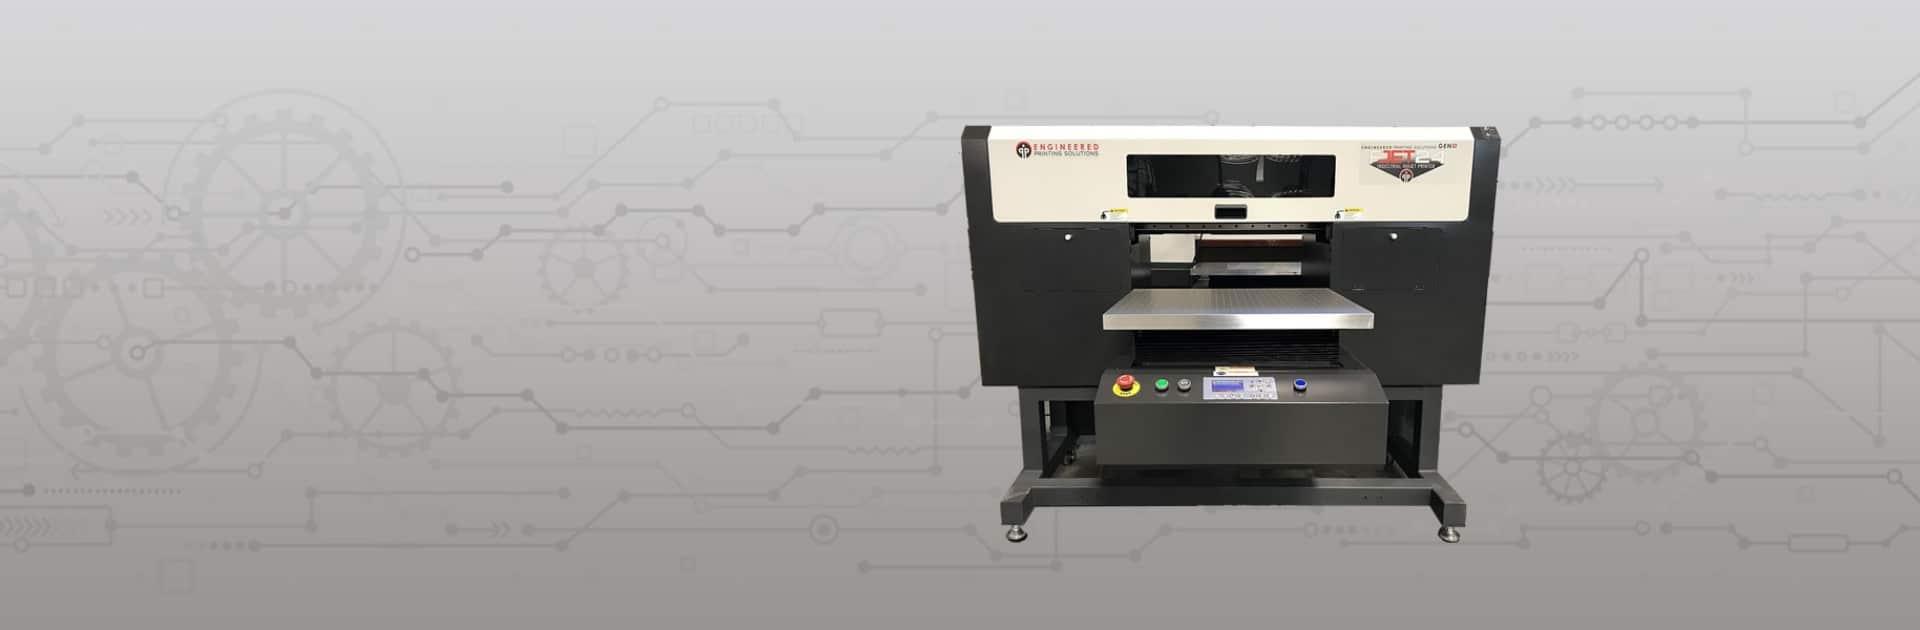 Fjet24 Gen2 Industrial Inkjet Printer